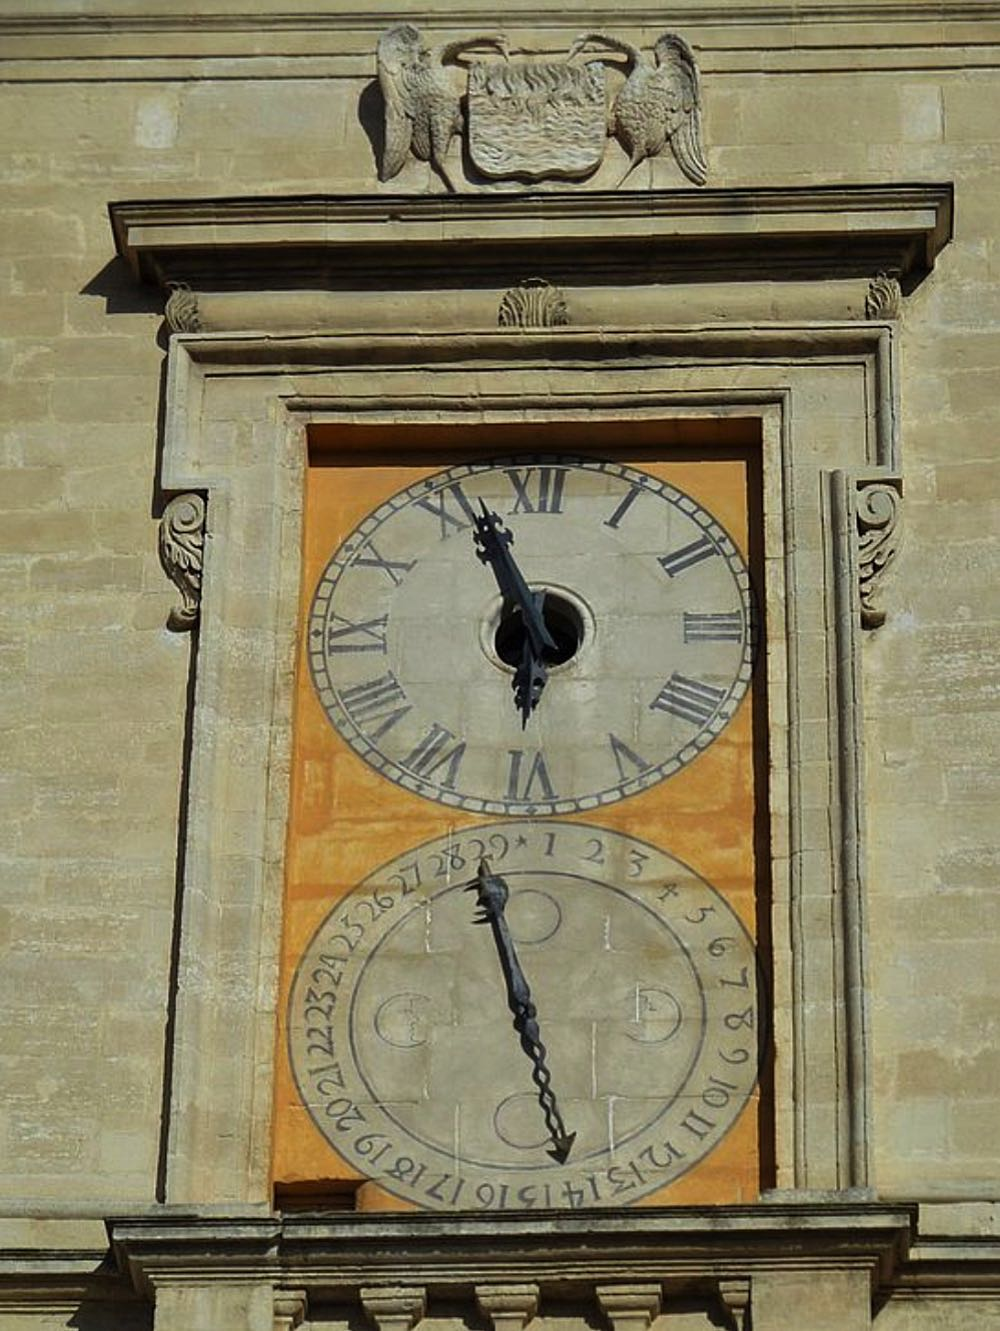 NOTRE-DAME-DES-ANGES clock